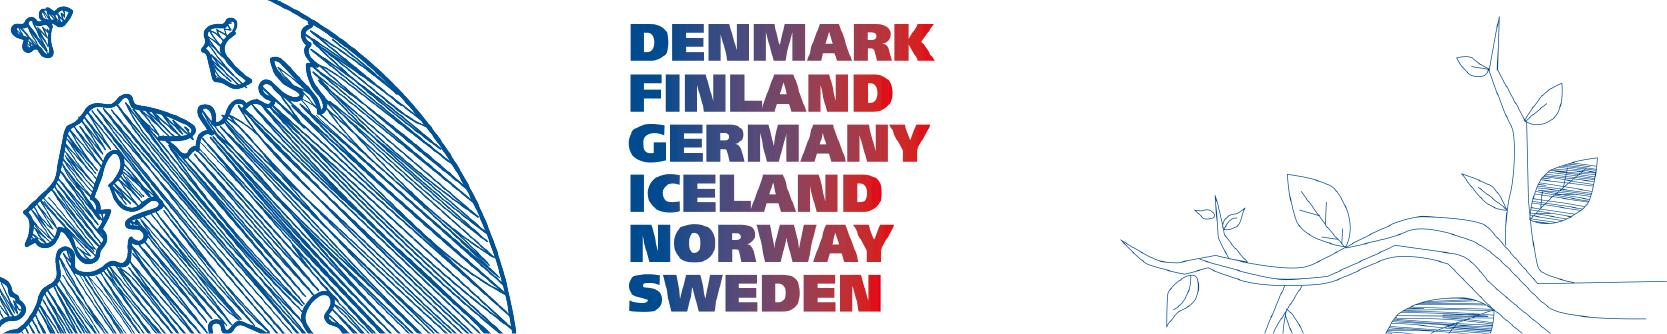 Visualisering, jorden, Denmark, Finland, Iceland, Norway, Sweden, en gren